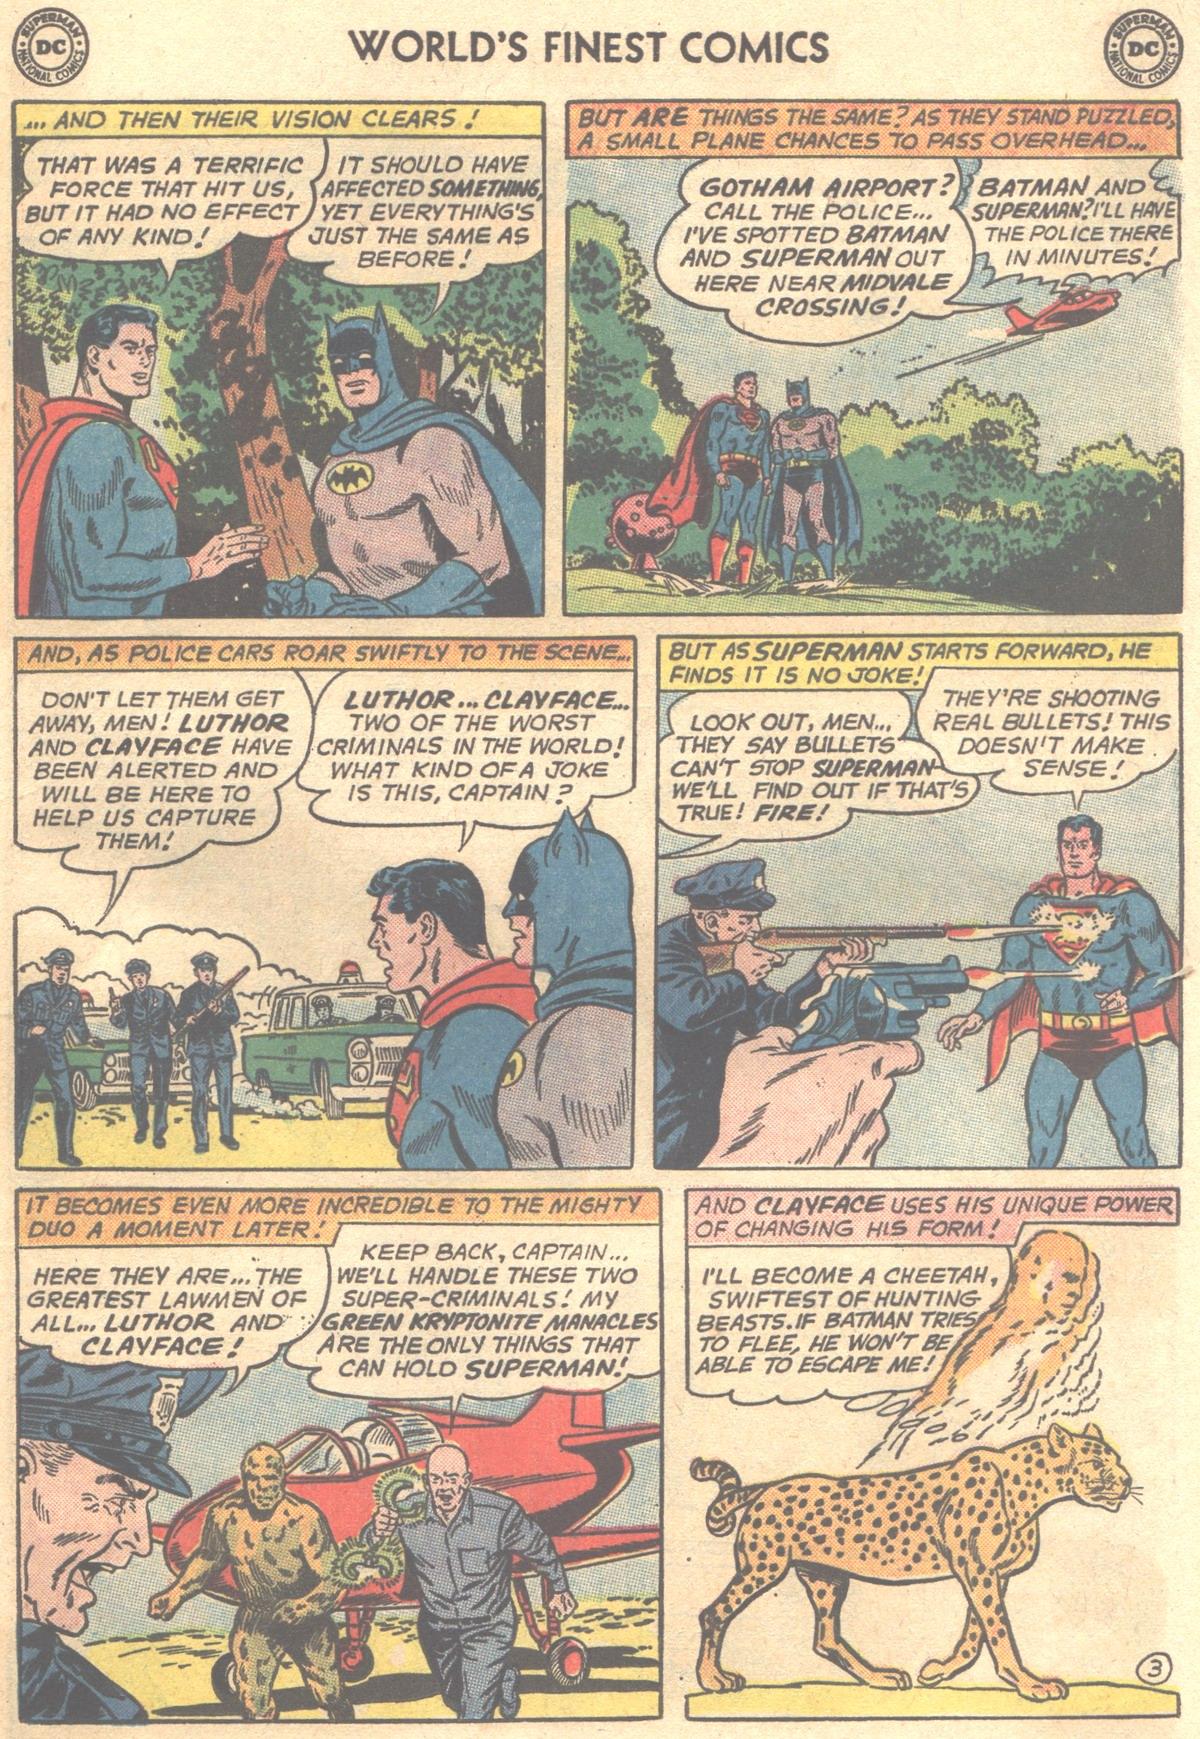 Read online World's Finest Comics comic -  Issue #148 - 5